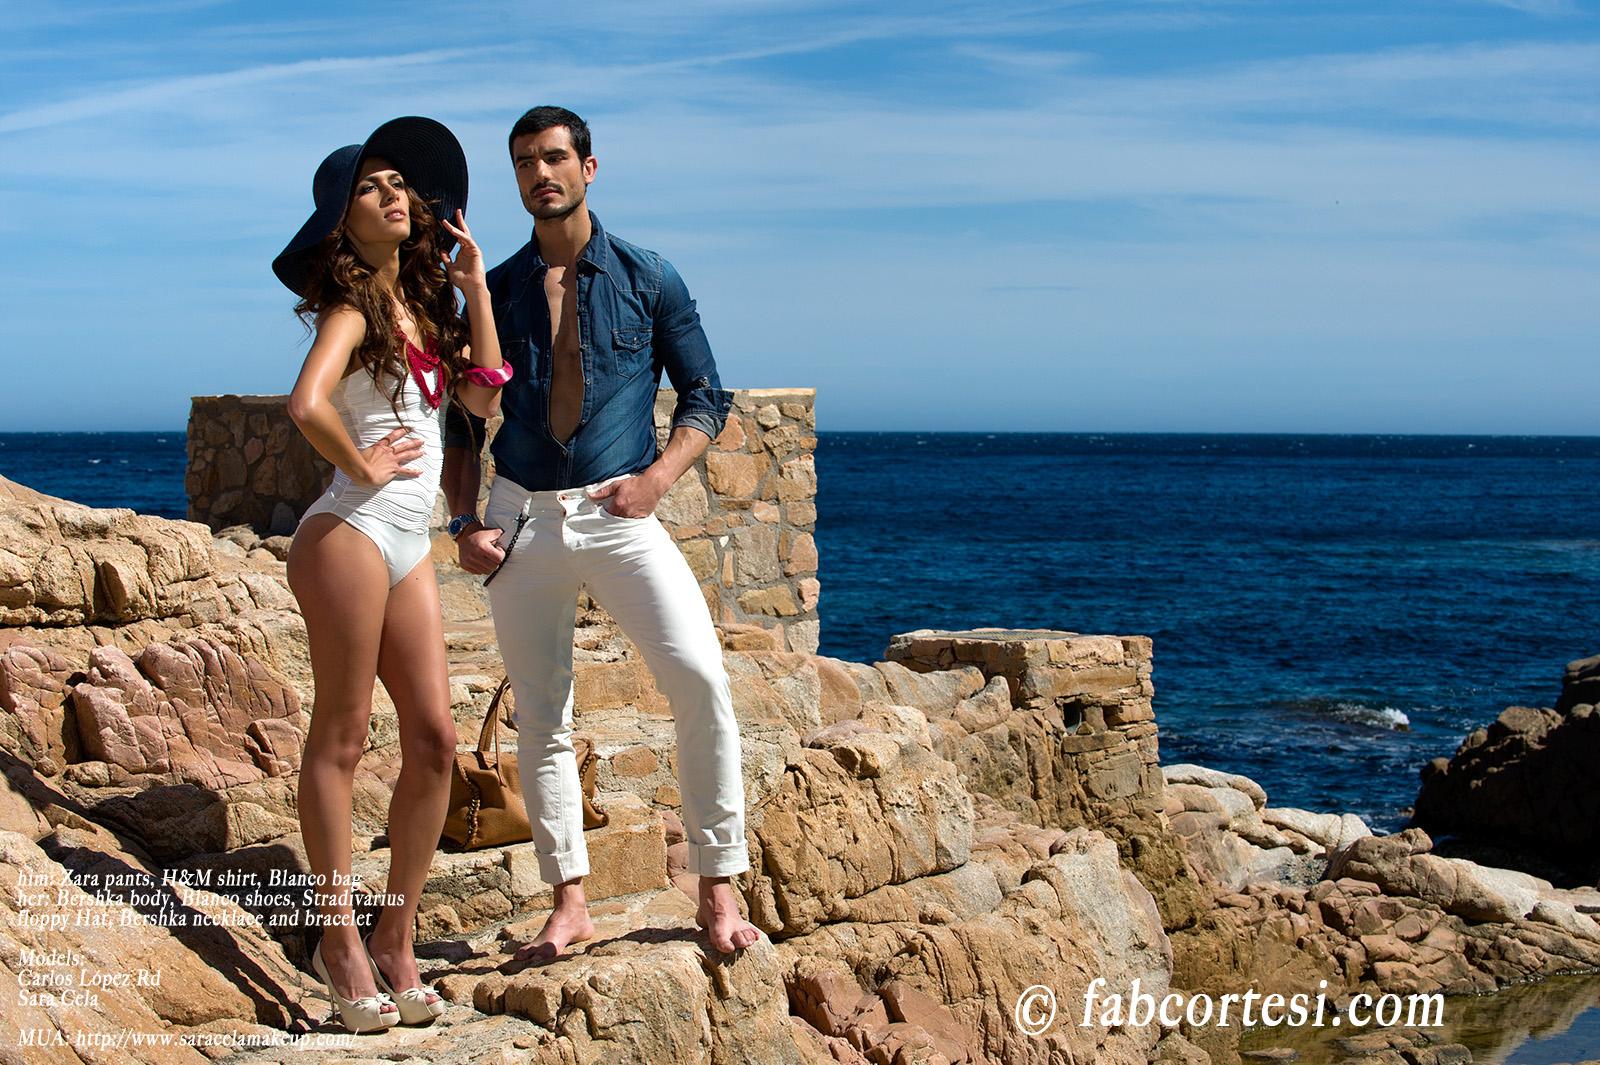 him: Zara pants, H&M shirt, Blanco bagher: Bershka body, Blanco shoes, Stradivarius floppy Hat, Bershka necklace and braceletModels: Carlos López RdSara CelaMUA: http://www.saracelamakeup.com/